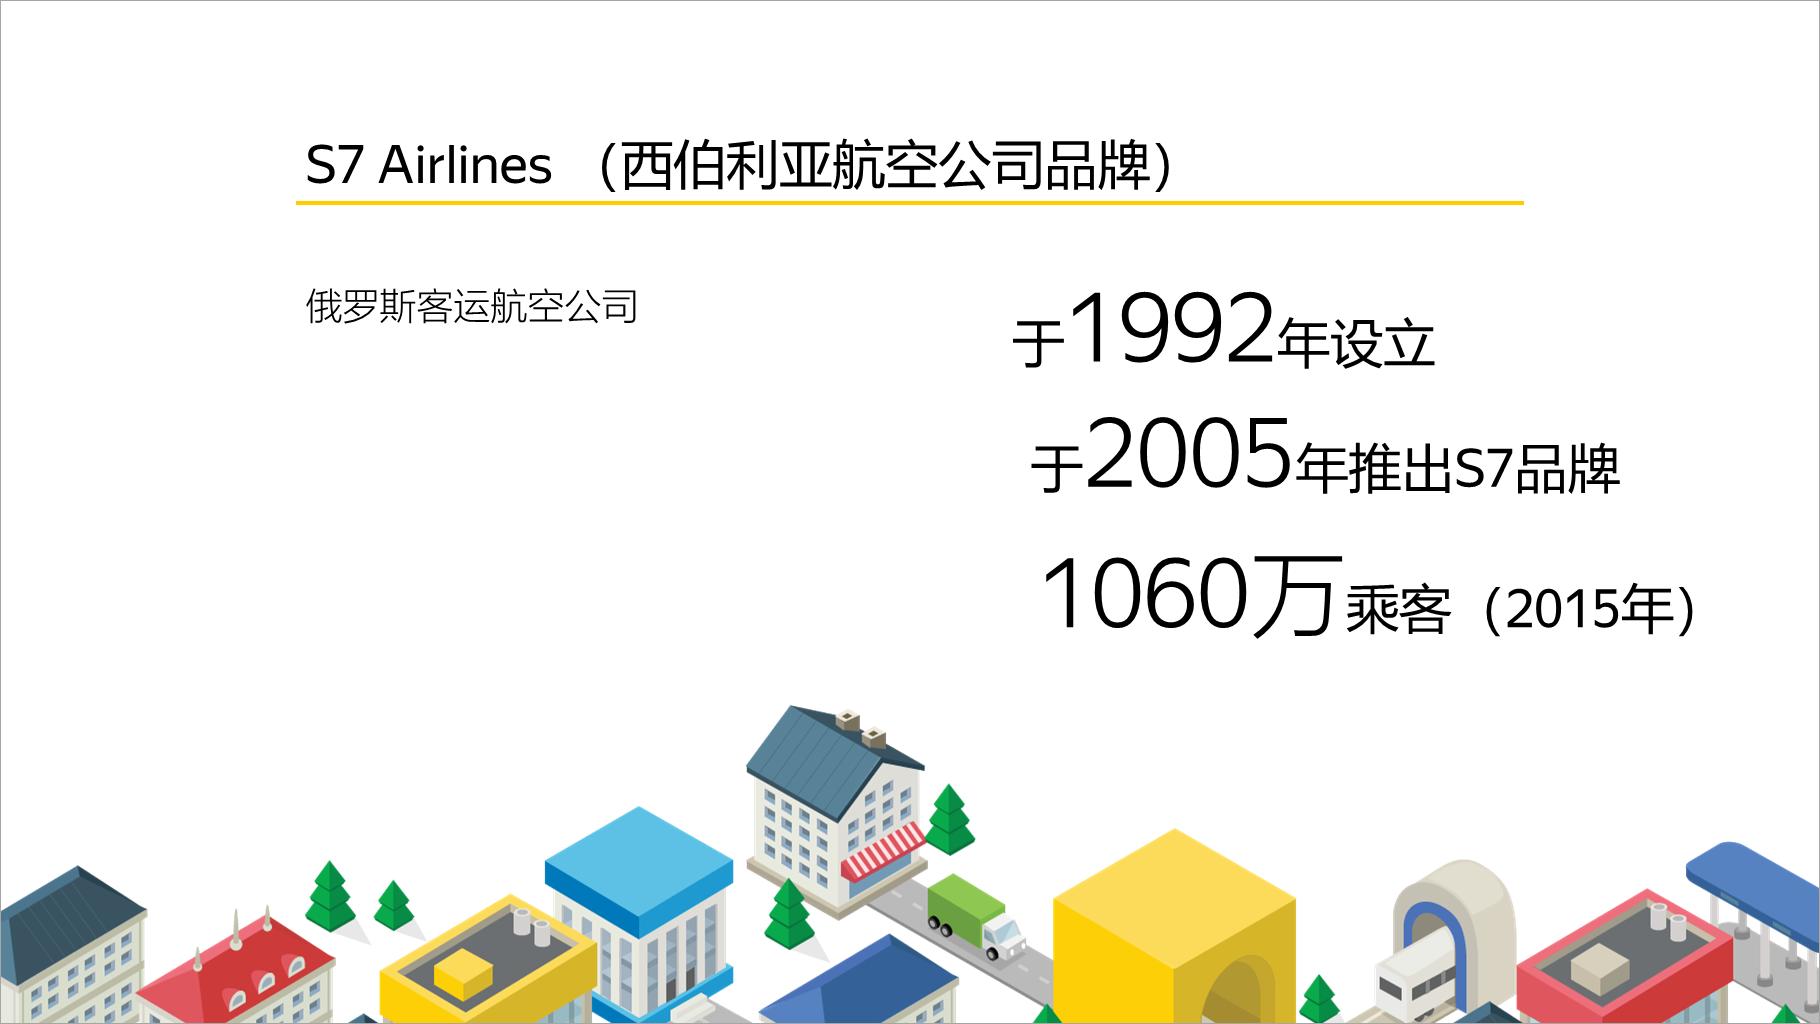 S7 Airlines (西伯利亚航空公司品牌)